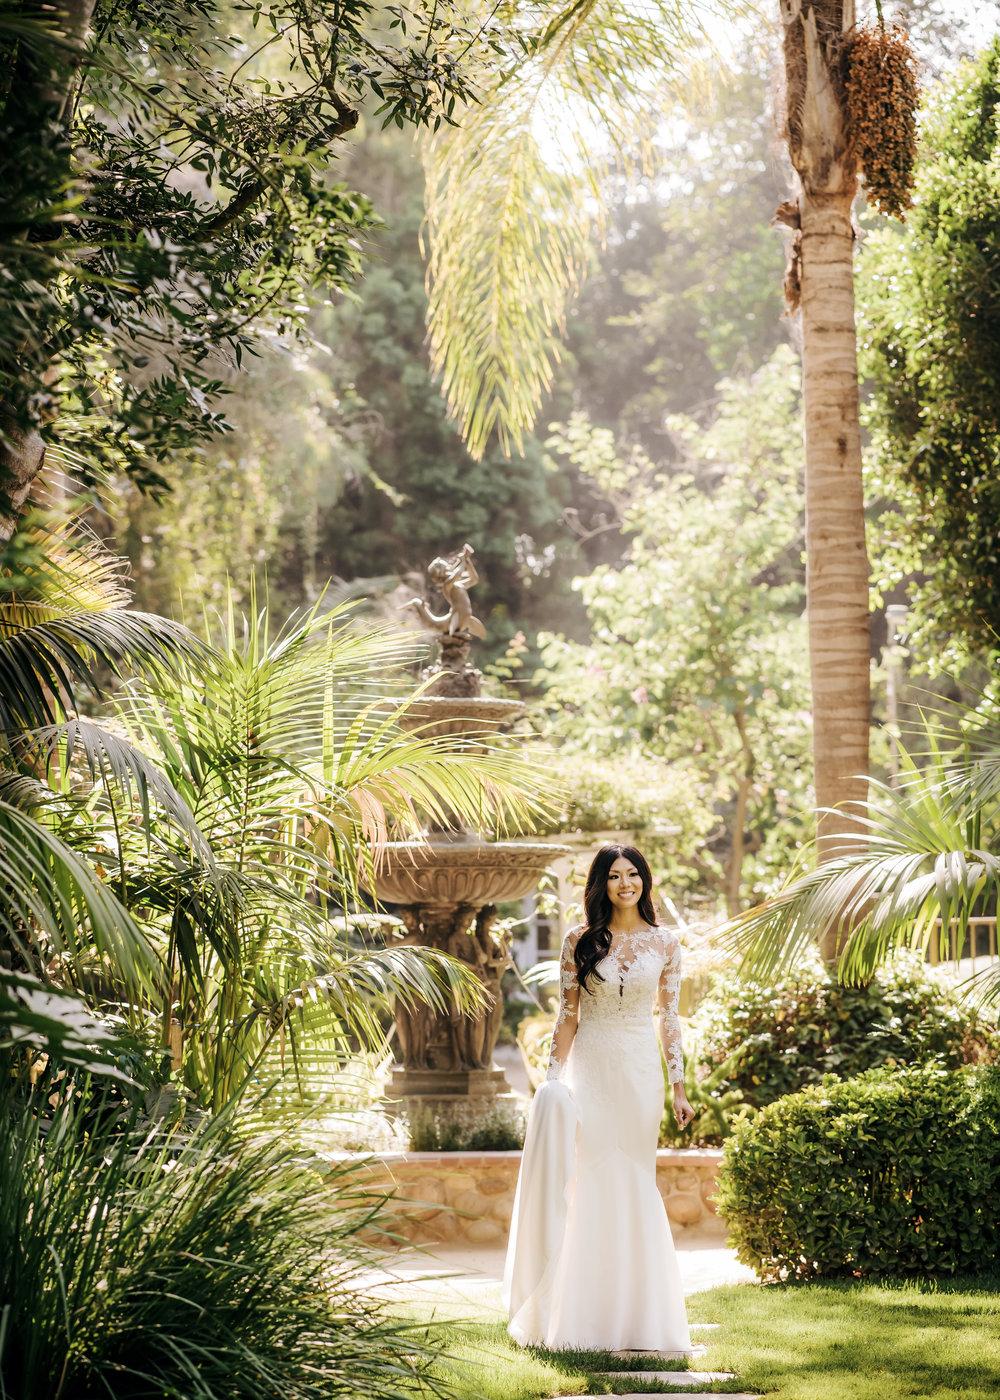 Turchin_20180825_Austinae-Brent-Wedding_108.jpg